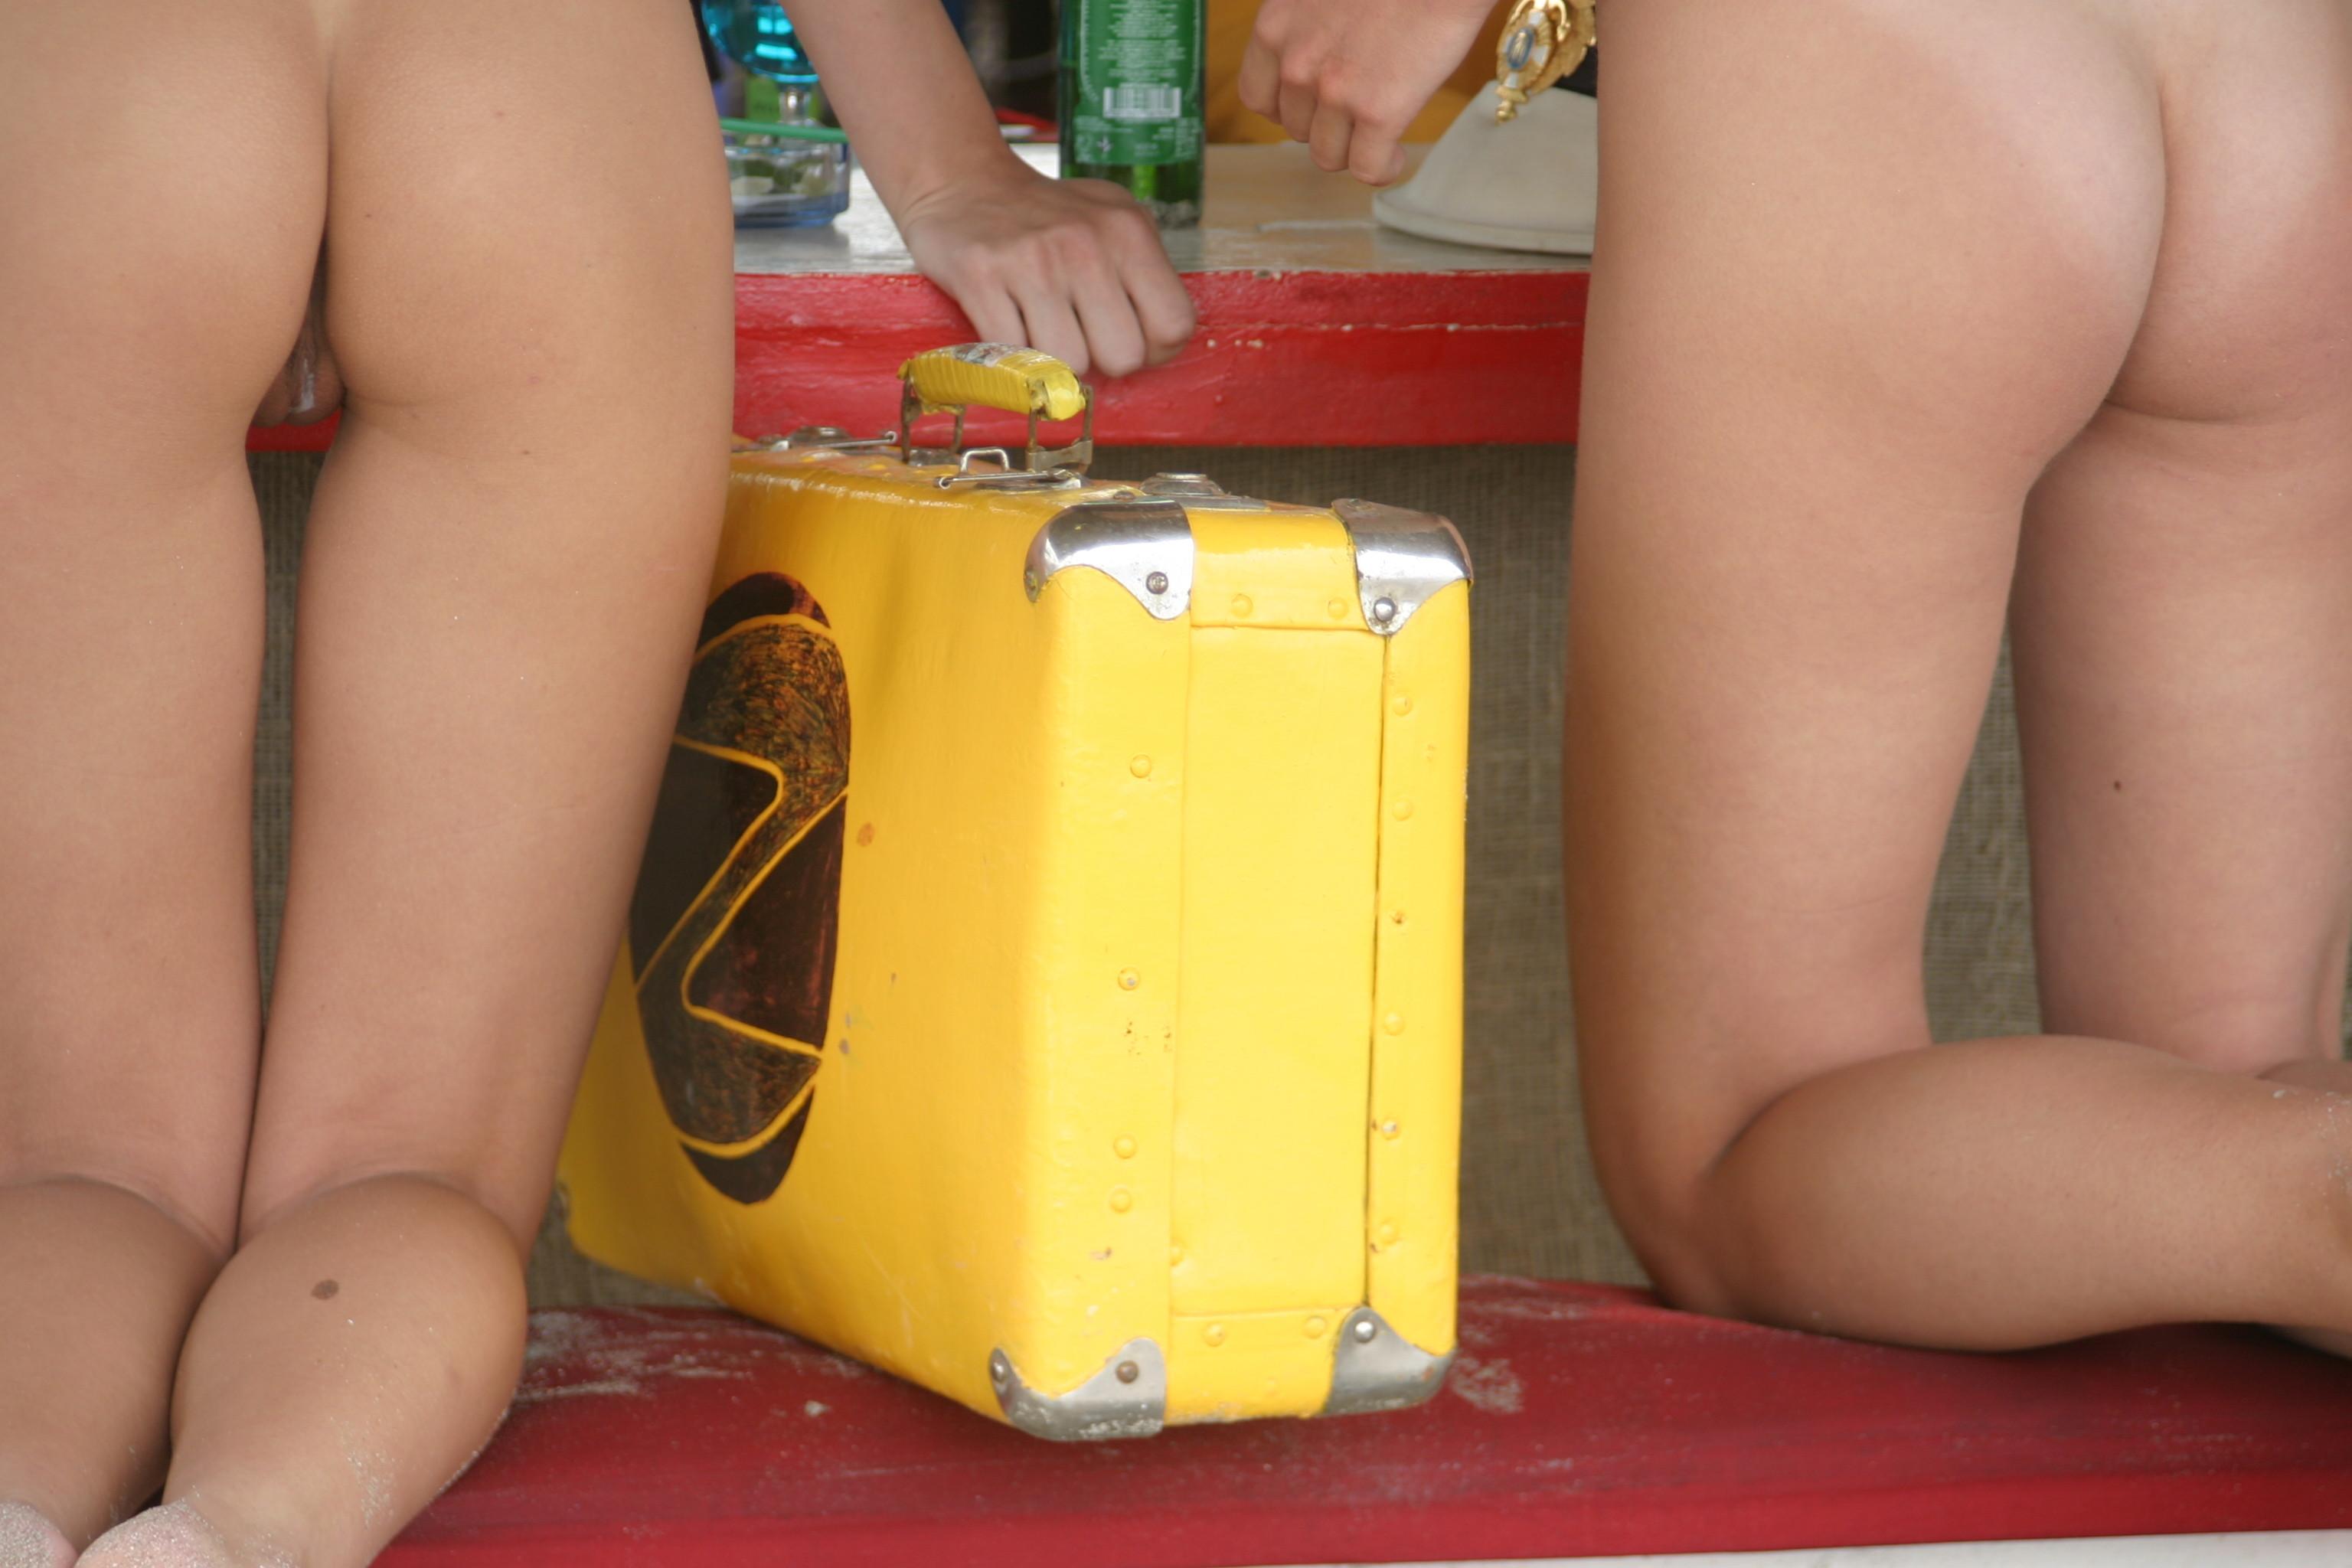 vika-y-lena-l-beach-nude-in-public-metart-46